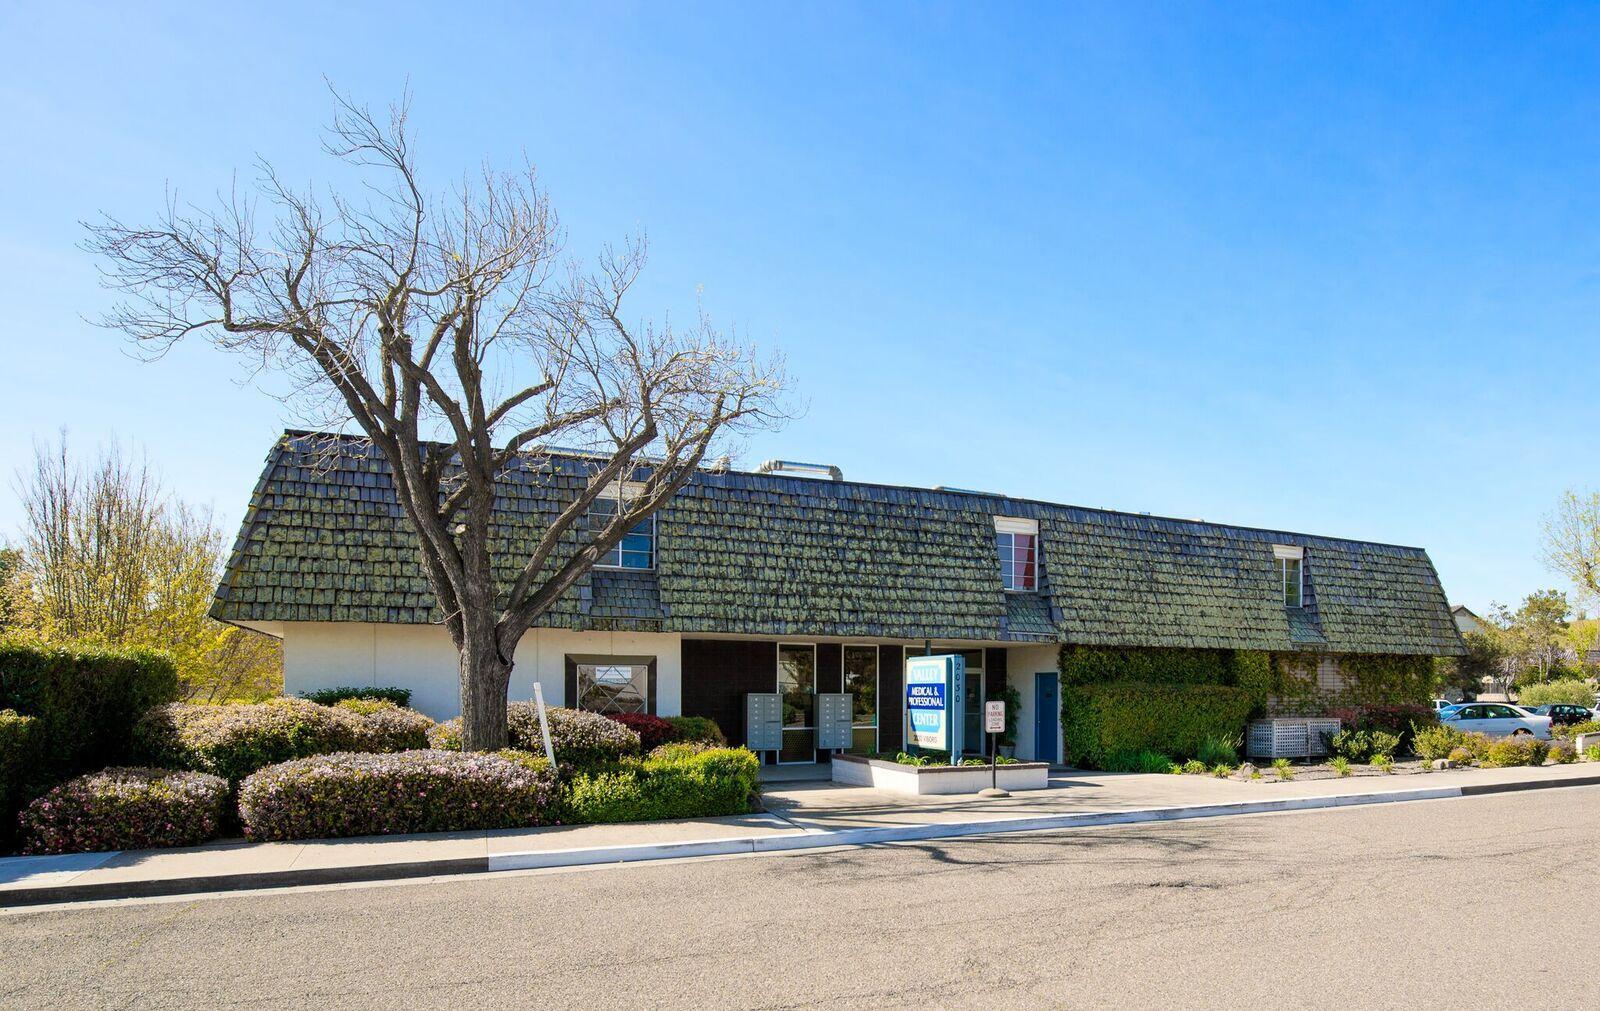 Property photo for 2030 Viborg Rd #200 Solvang, California 93463 - 17-3036